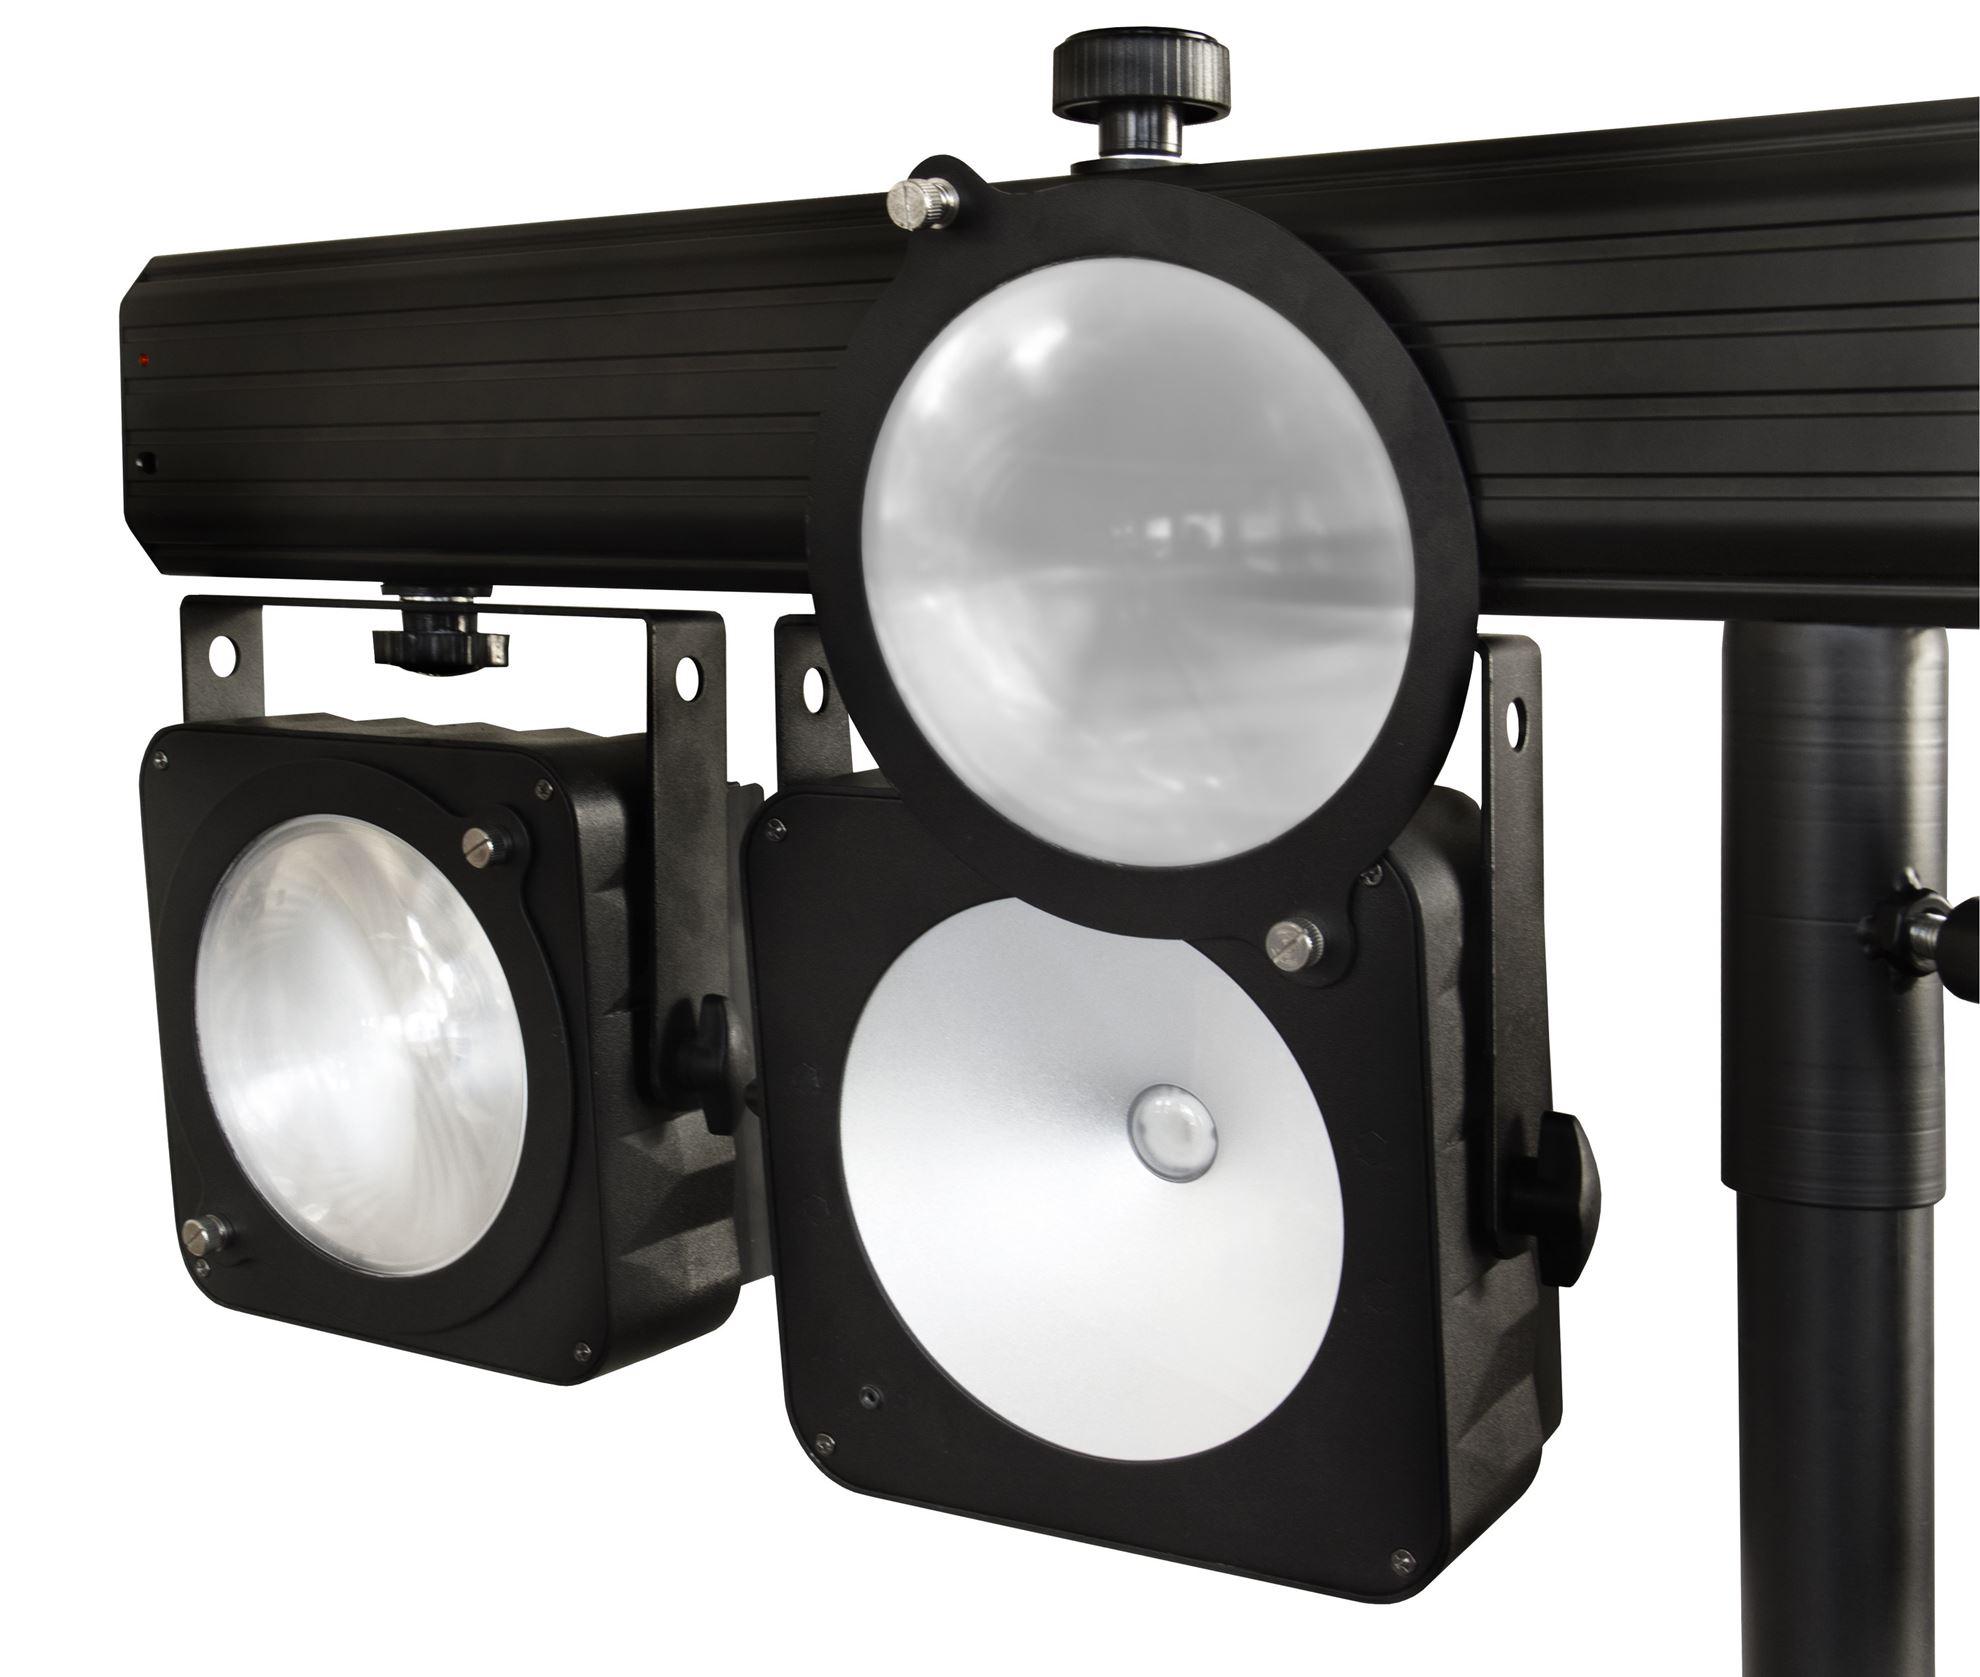 jbsystems cob 4bar. Black Bedroom Furniture Sets. Home Design Ideas